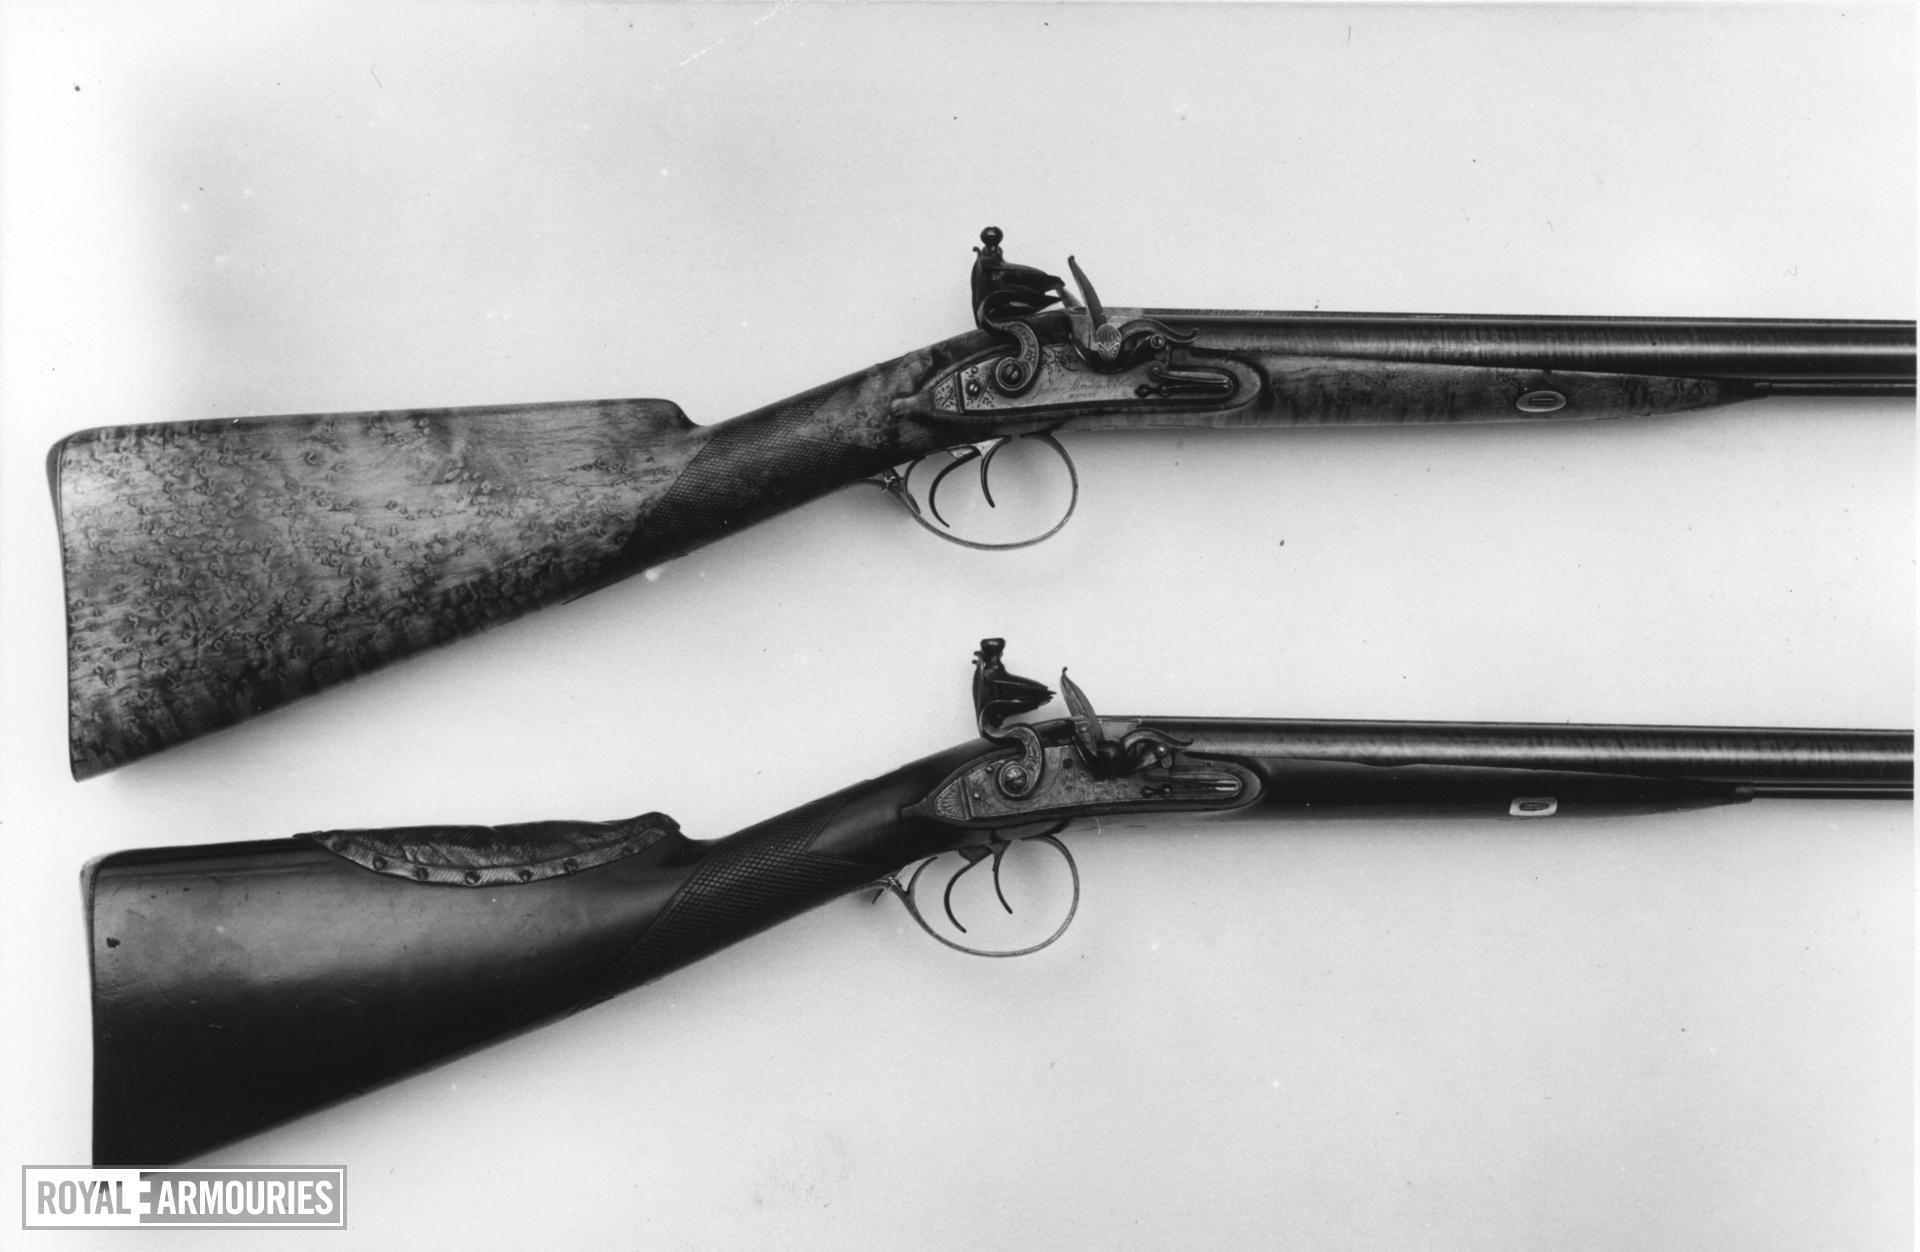 Flintlock double-barrelled shotgun - By Staudenmayer Flintlock double barrelled shotgun by Staudenmayer about 1815.